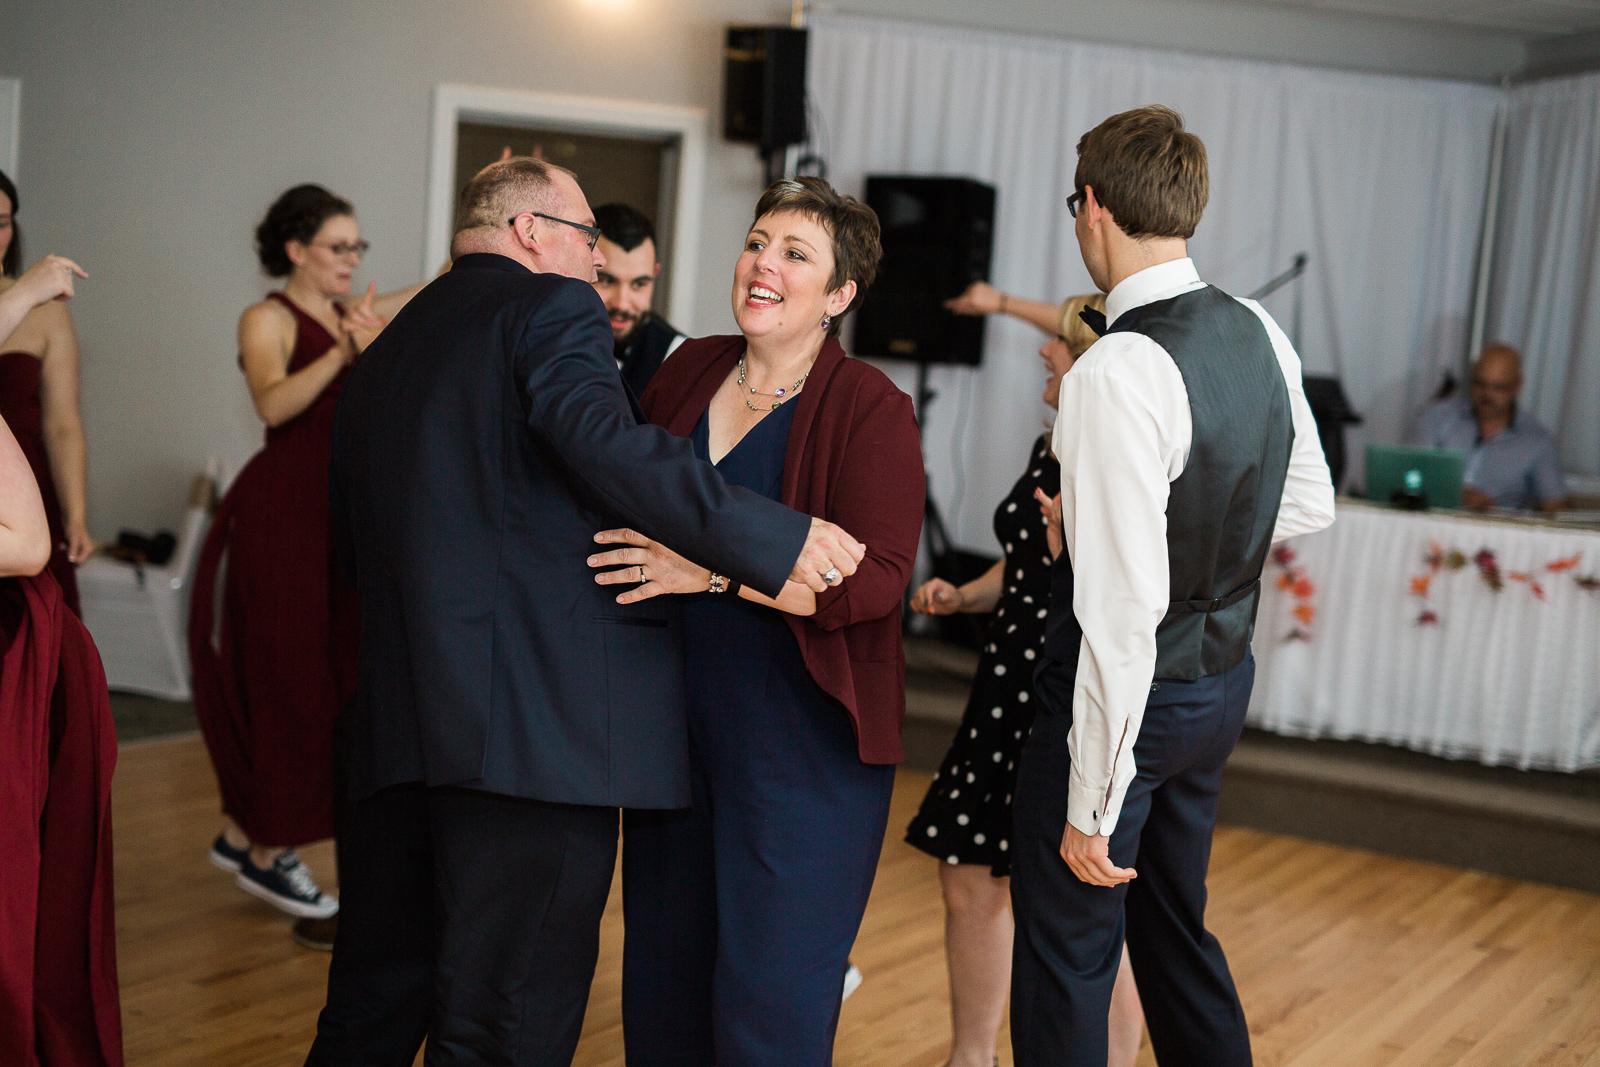 gander-wedding-photographer-162.jpg